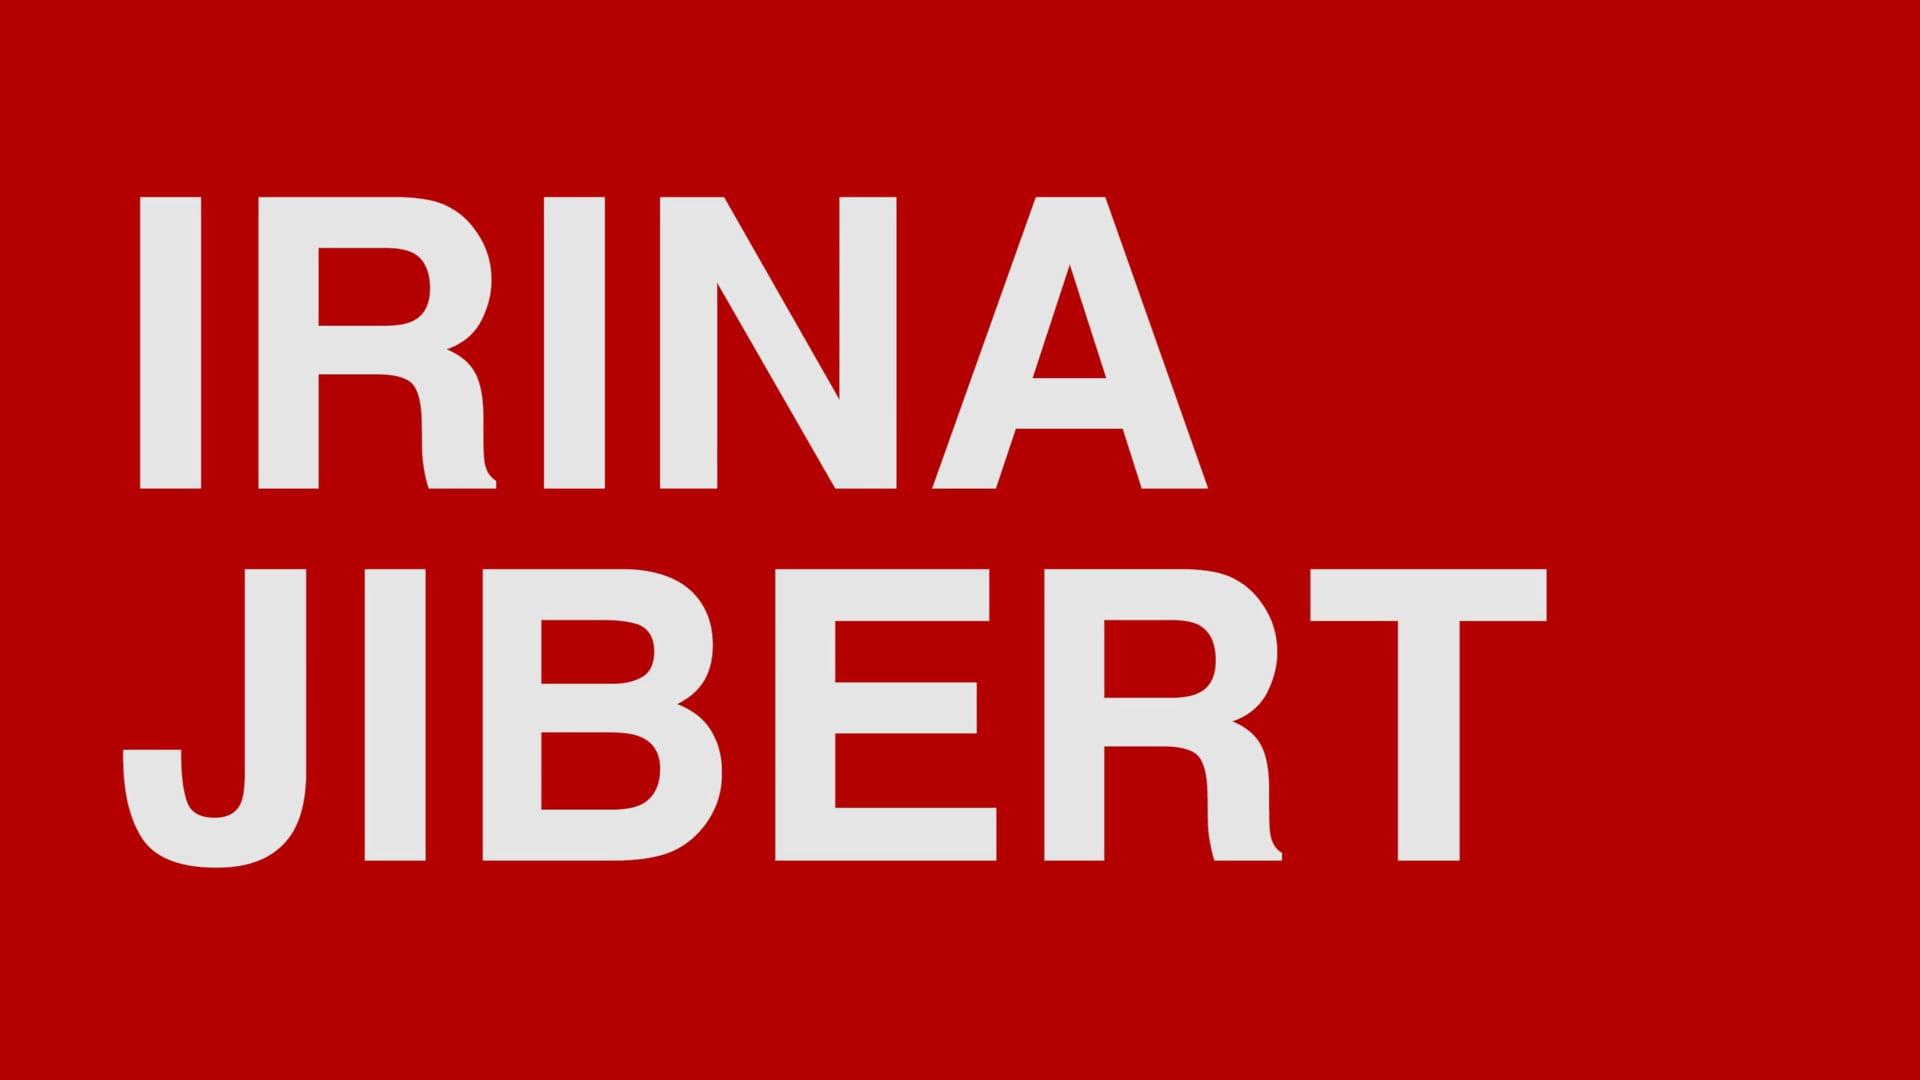 Residencia Artística R.A.R.O Madrid - Irina Jibert (Octubre - Noviembre 2017)